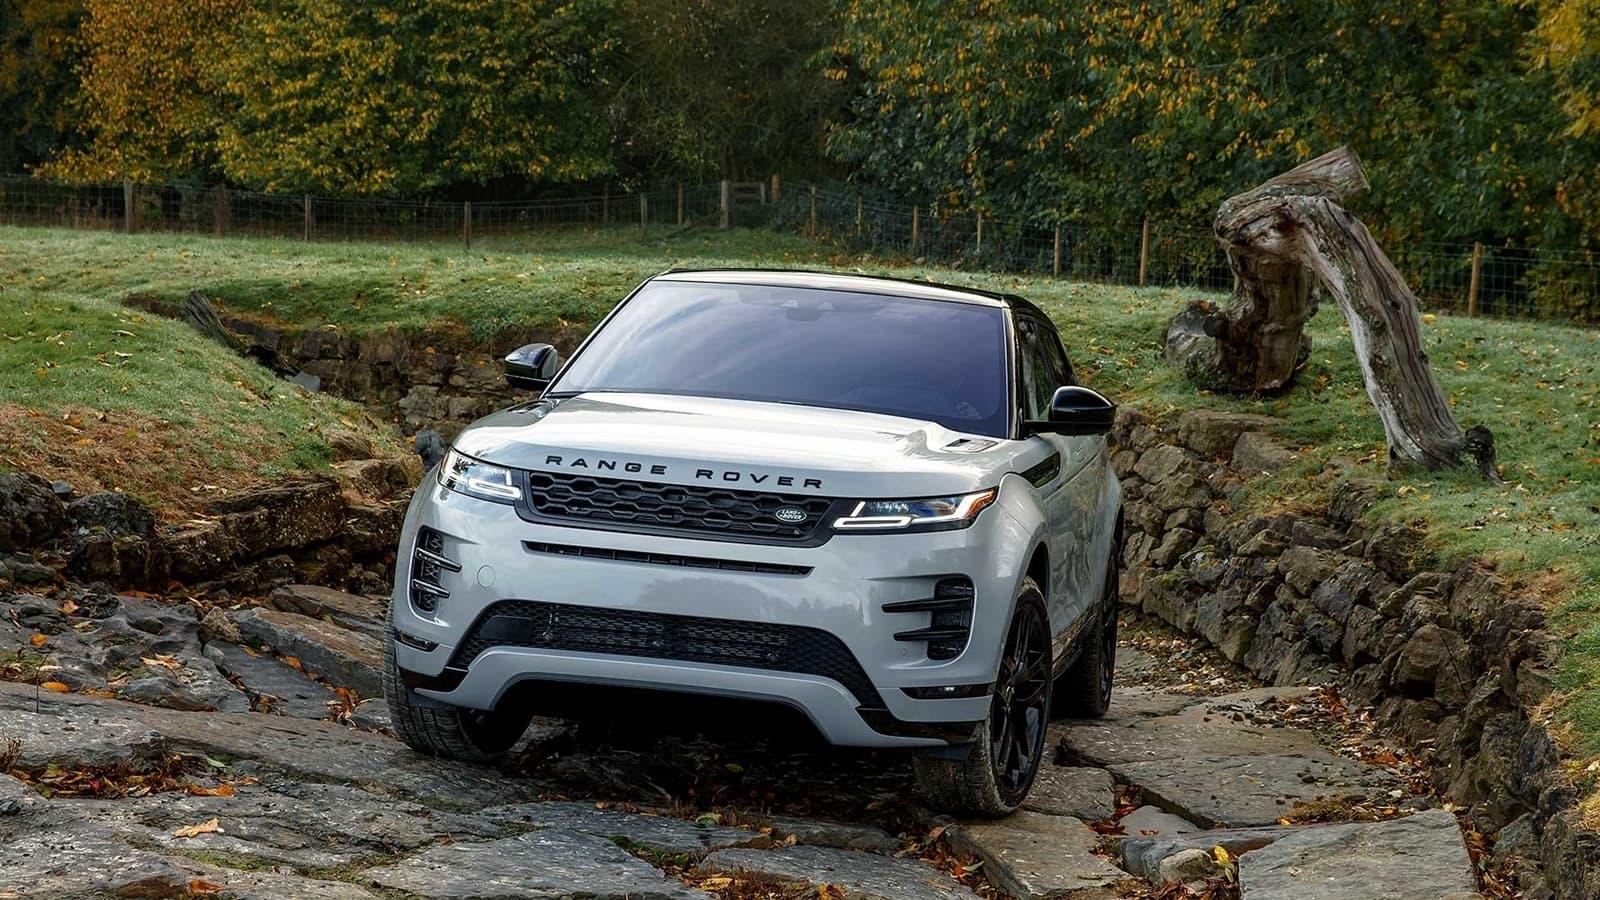 Range Rover Evoque 2019 1118 011